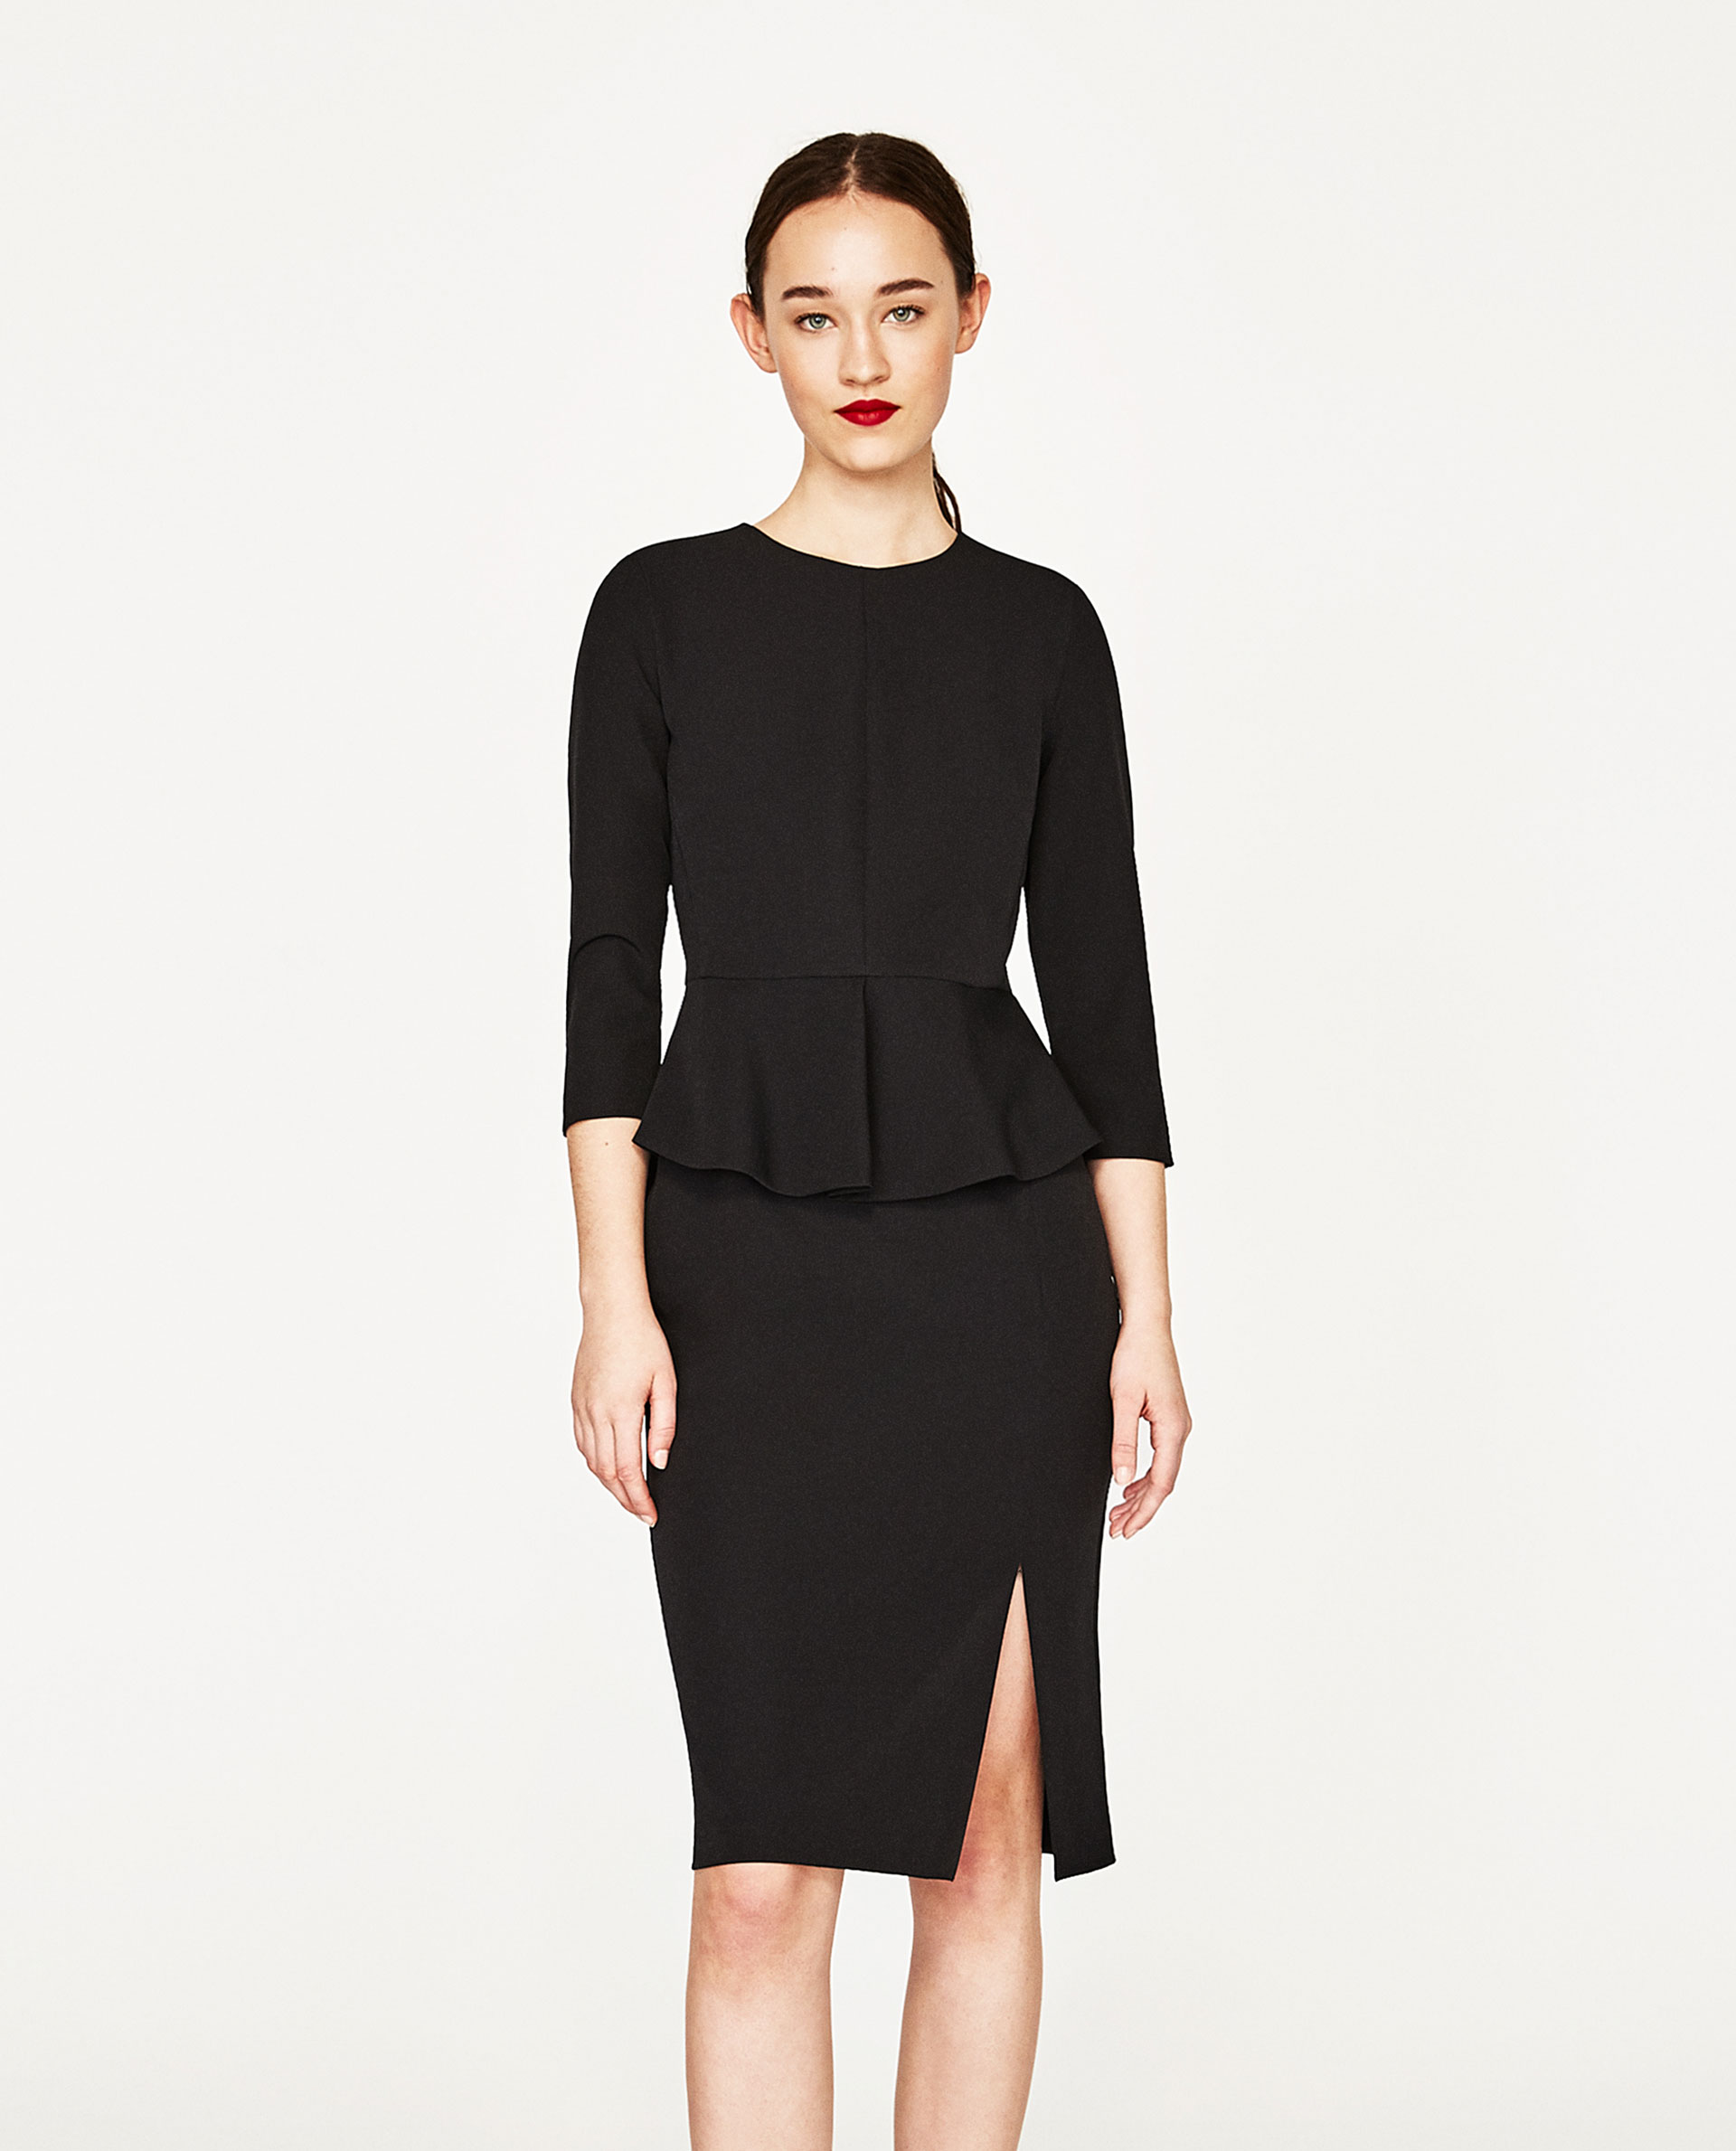 Vestito elegante Zara con peplum